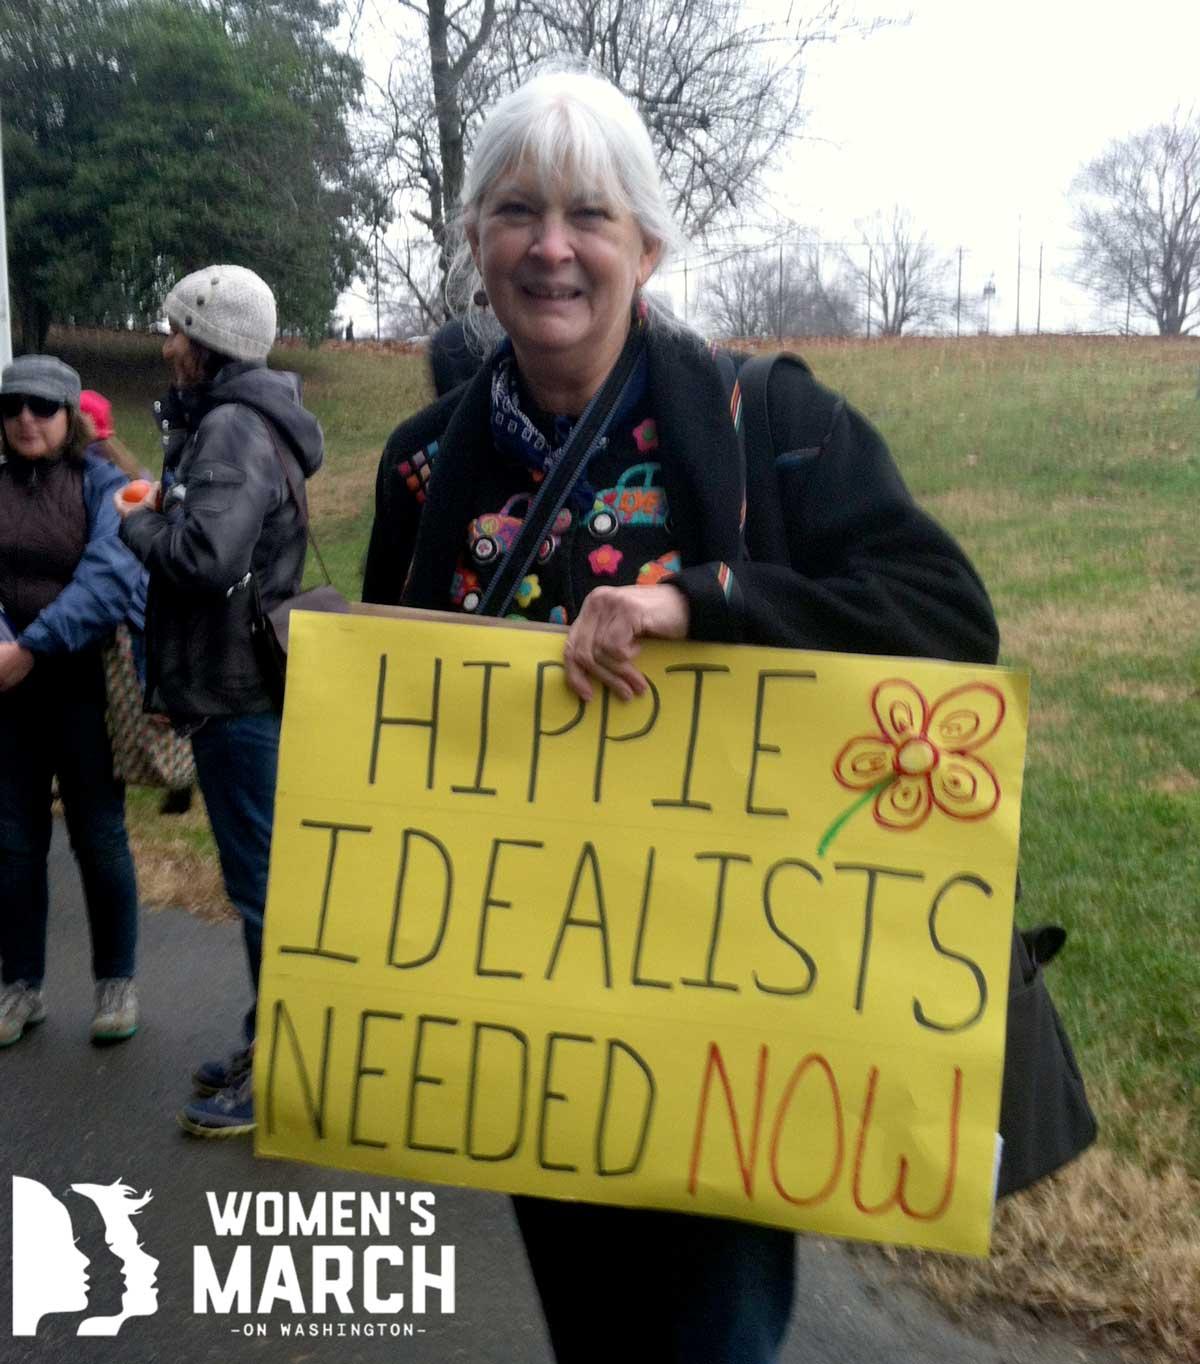 """Hippie idealists needed now."""